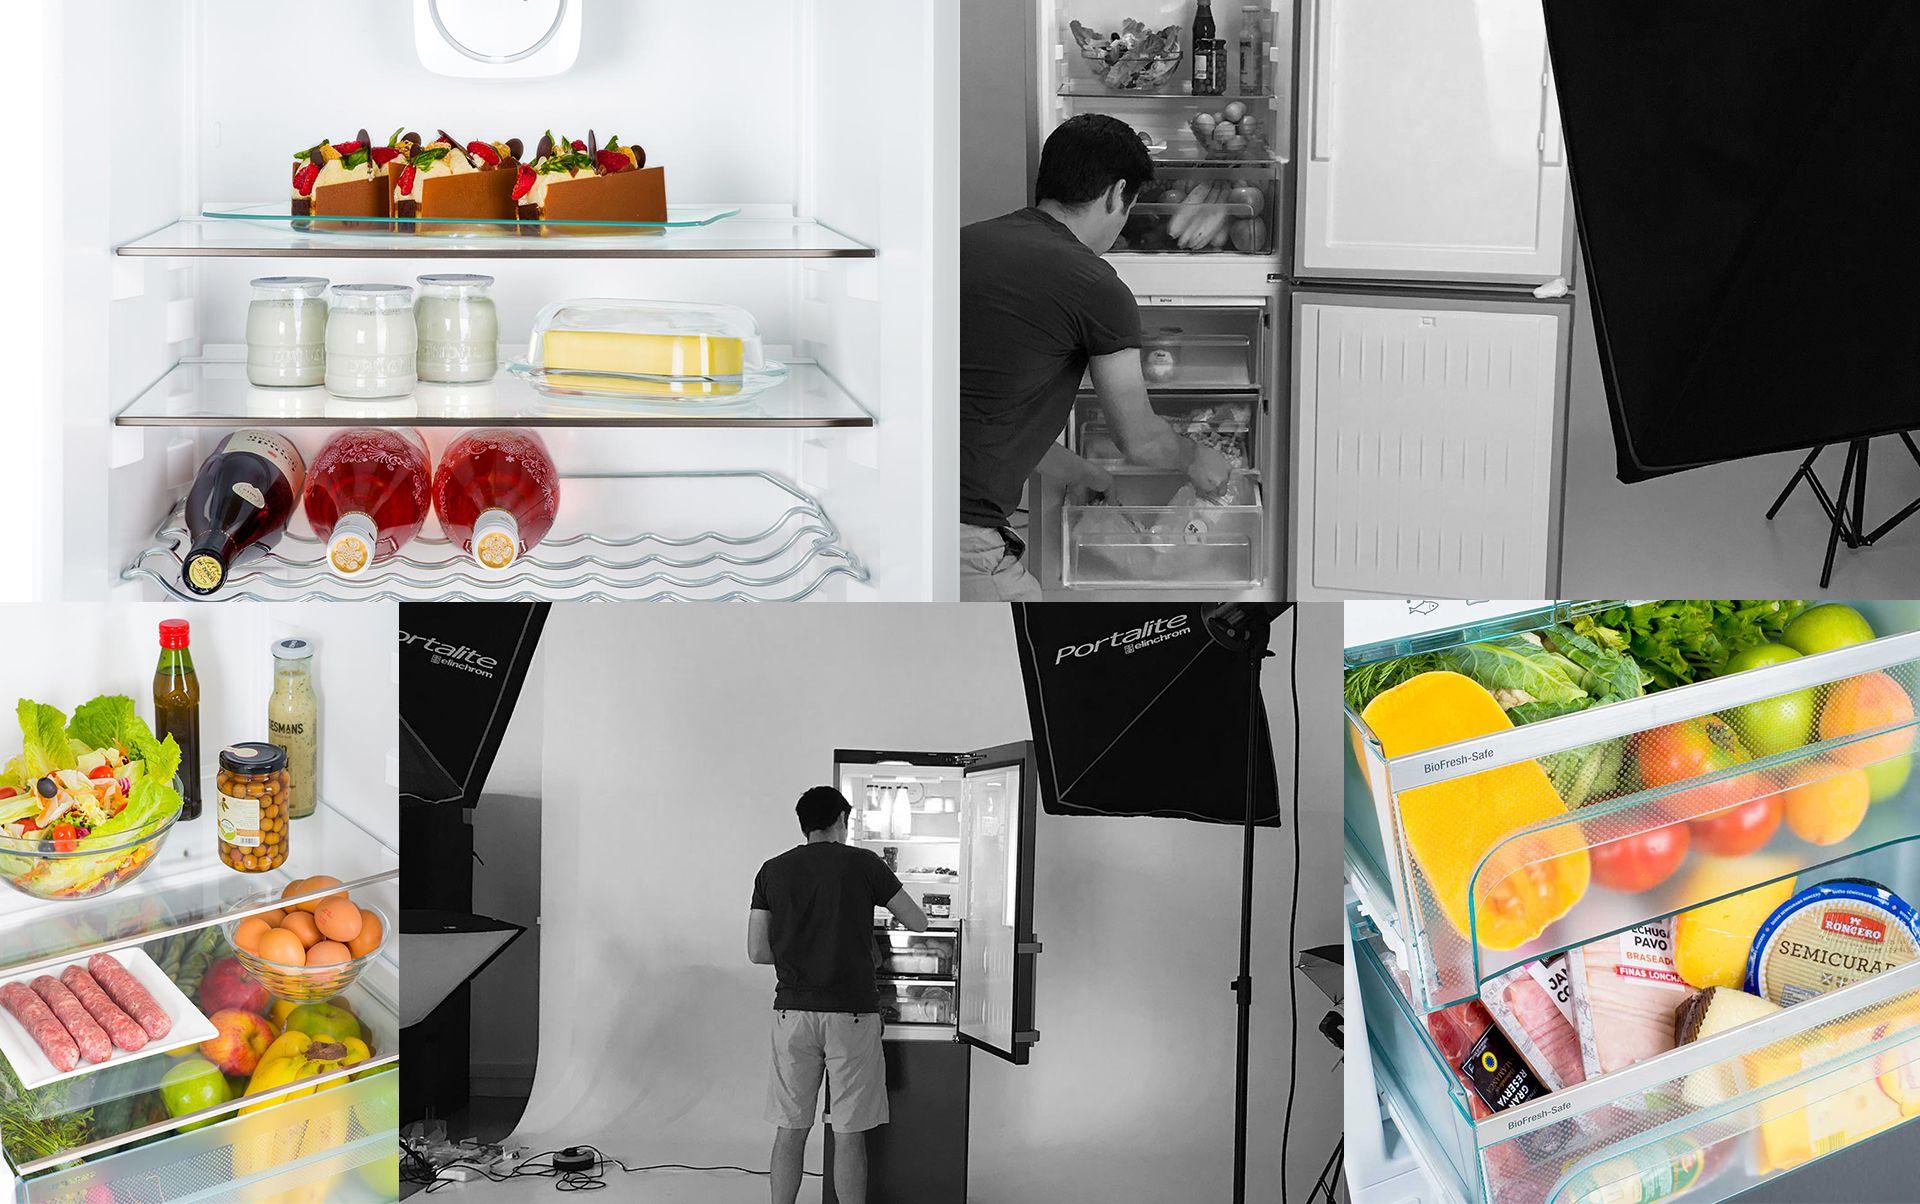 Interior neveras sesio fotografica - Sesión fotográfica de electrodomésticos